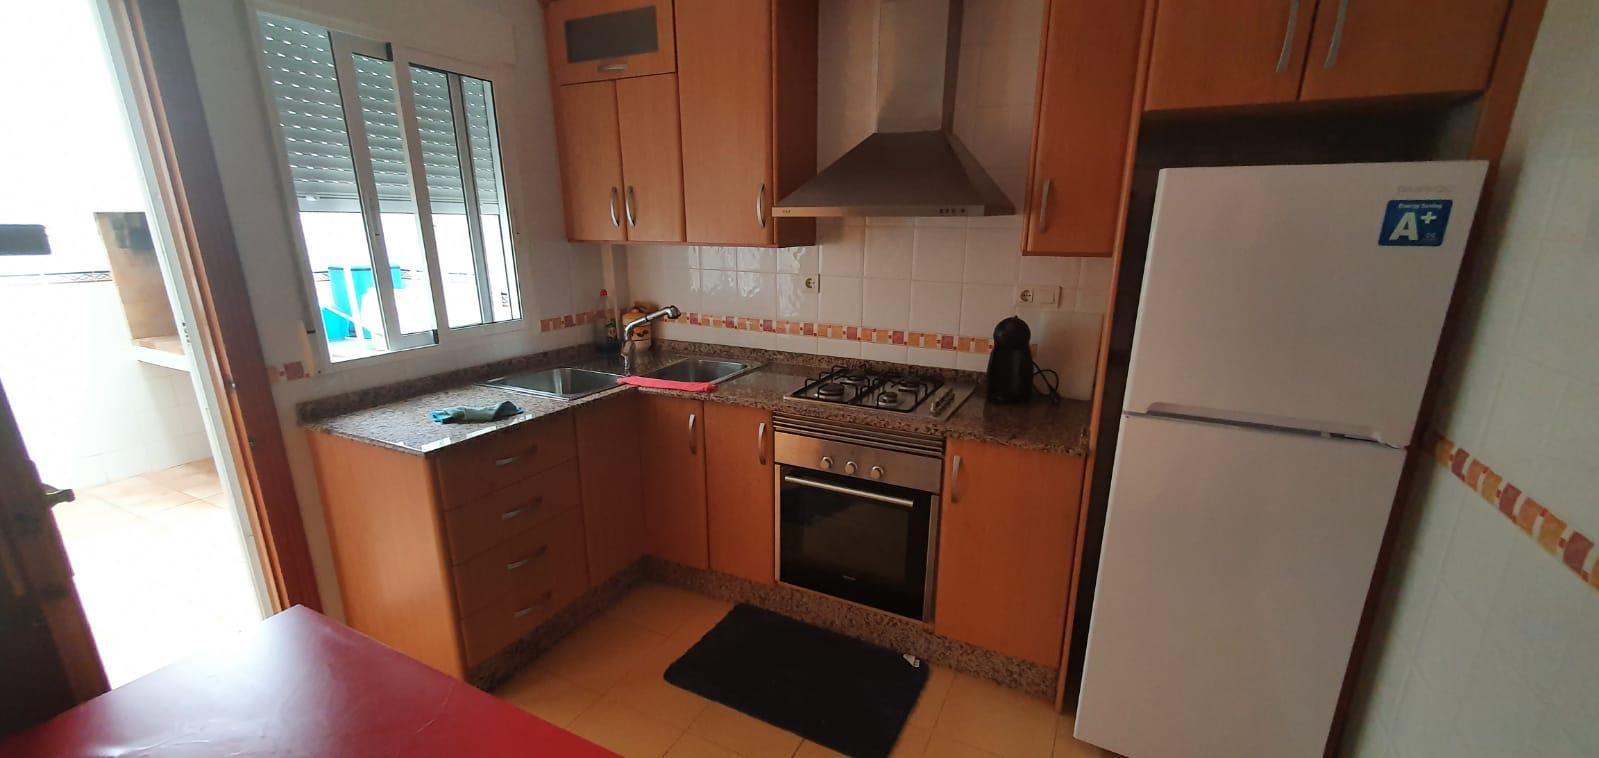 kf943678: Townhouse for sale in Torre de la Horadada